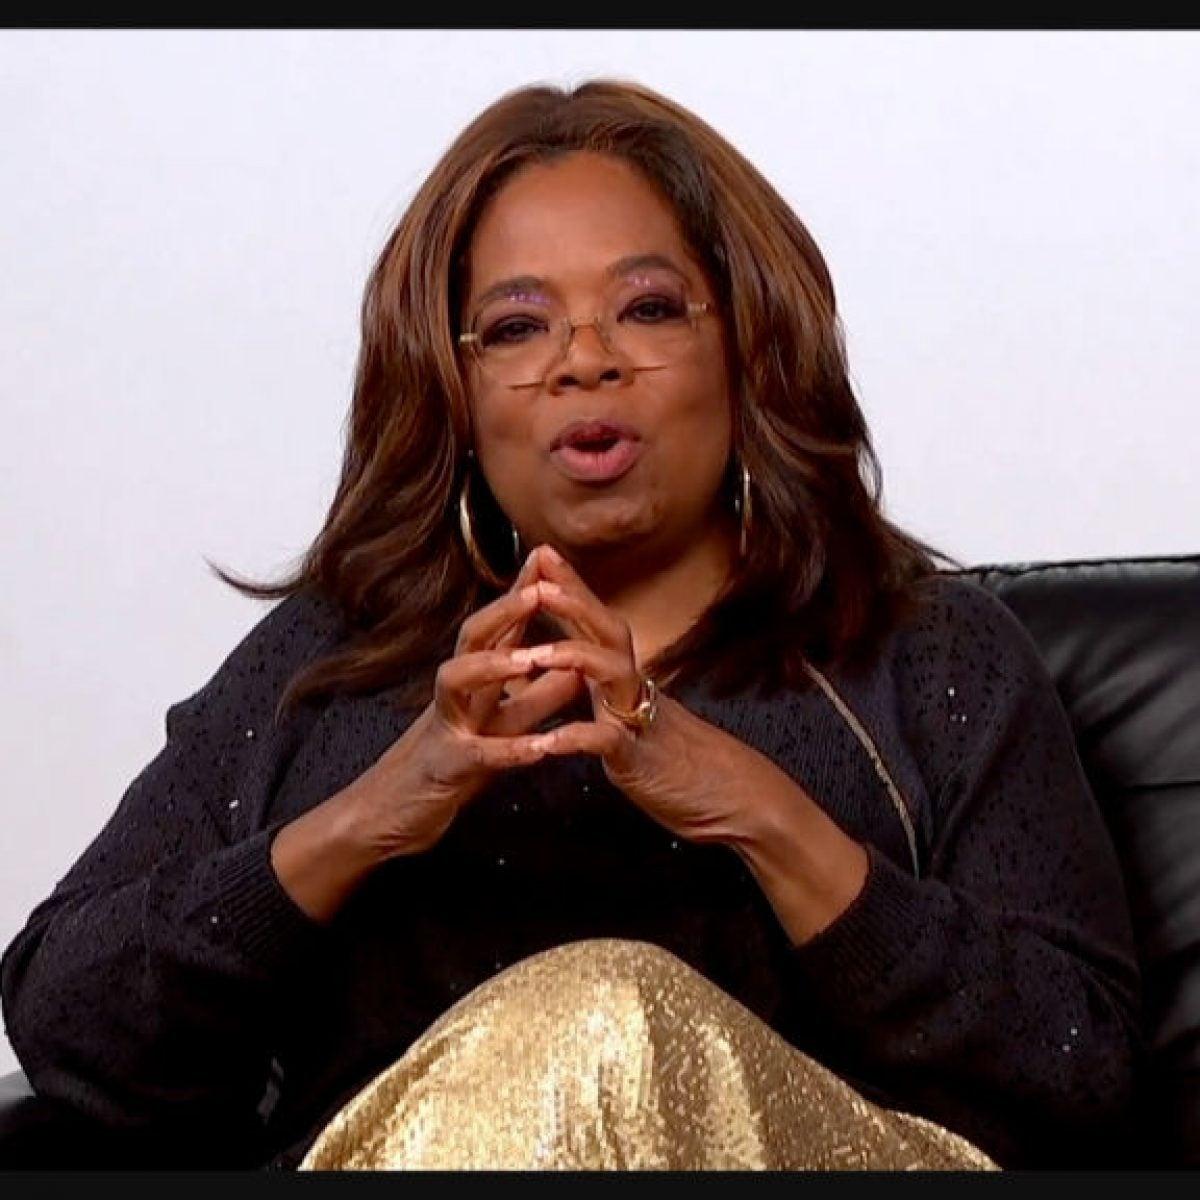 Oprah Winfrey Documentary Coming To Apple TV+